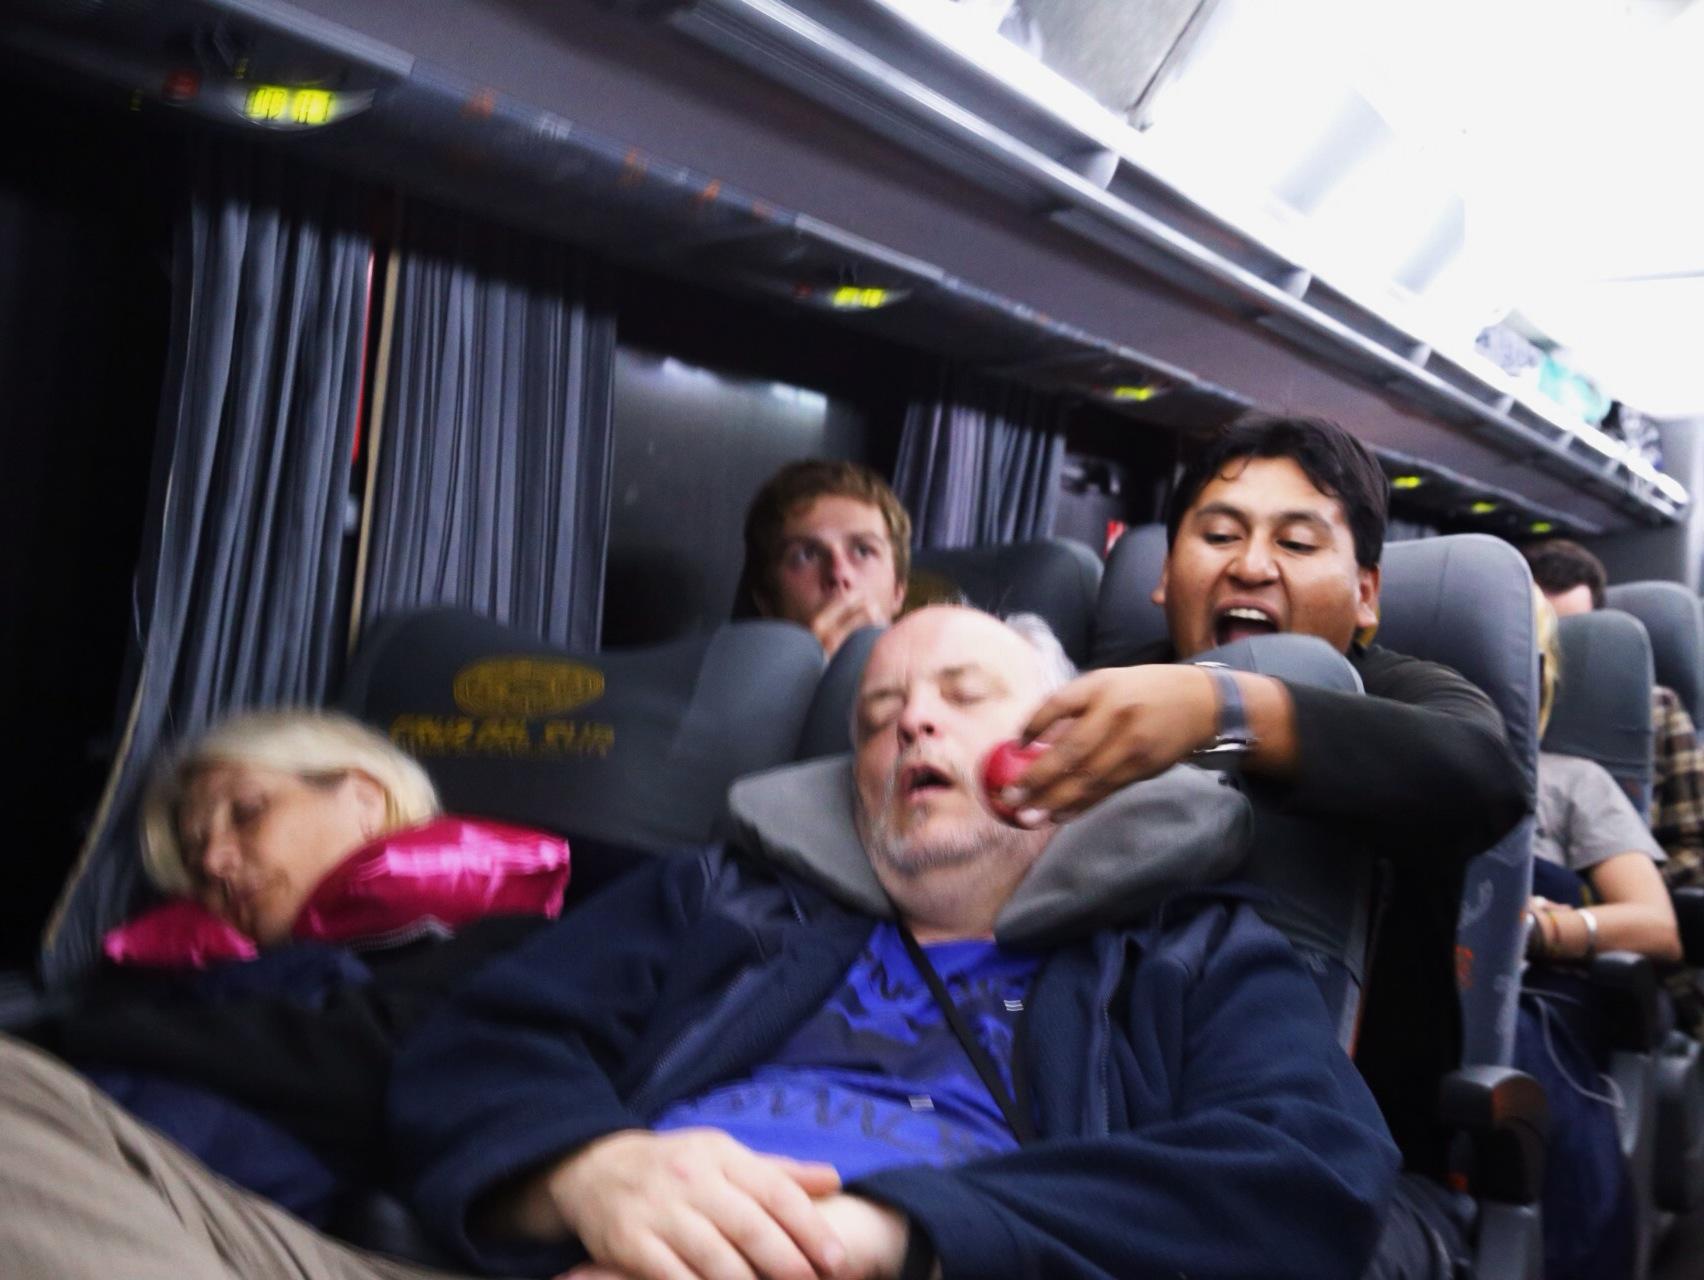 Yuri sharing his feelings of the snoring man